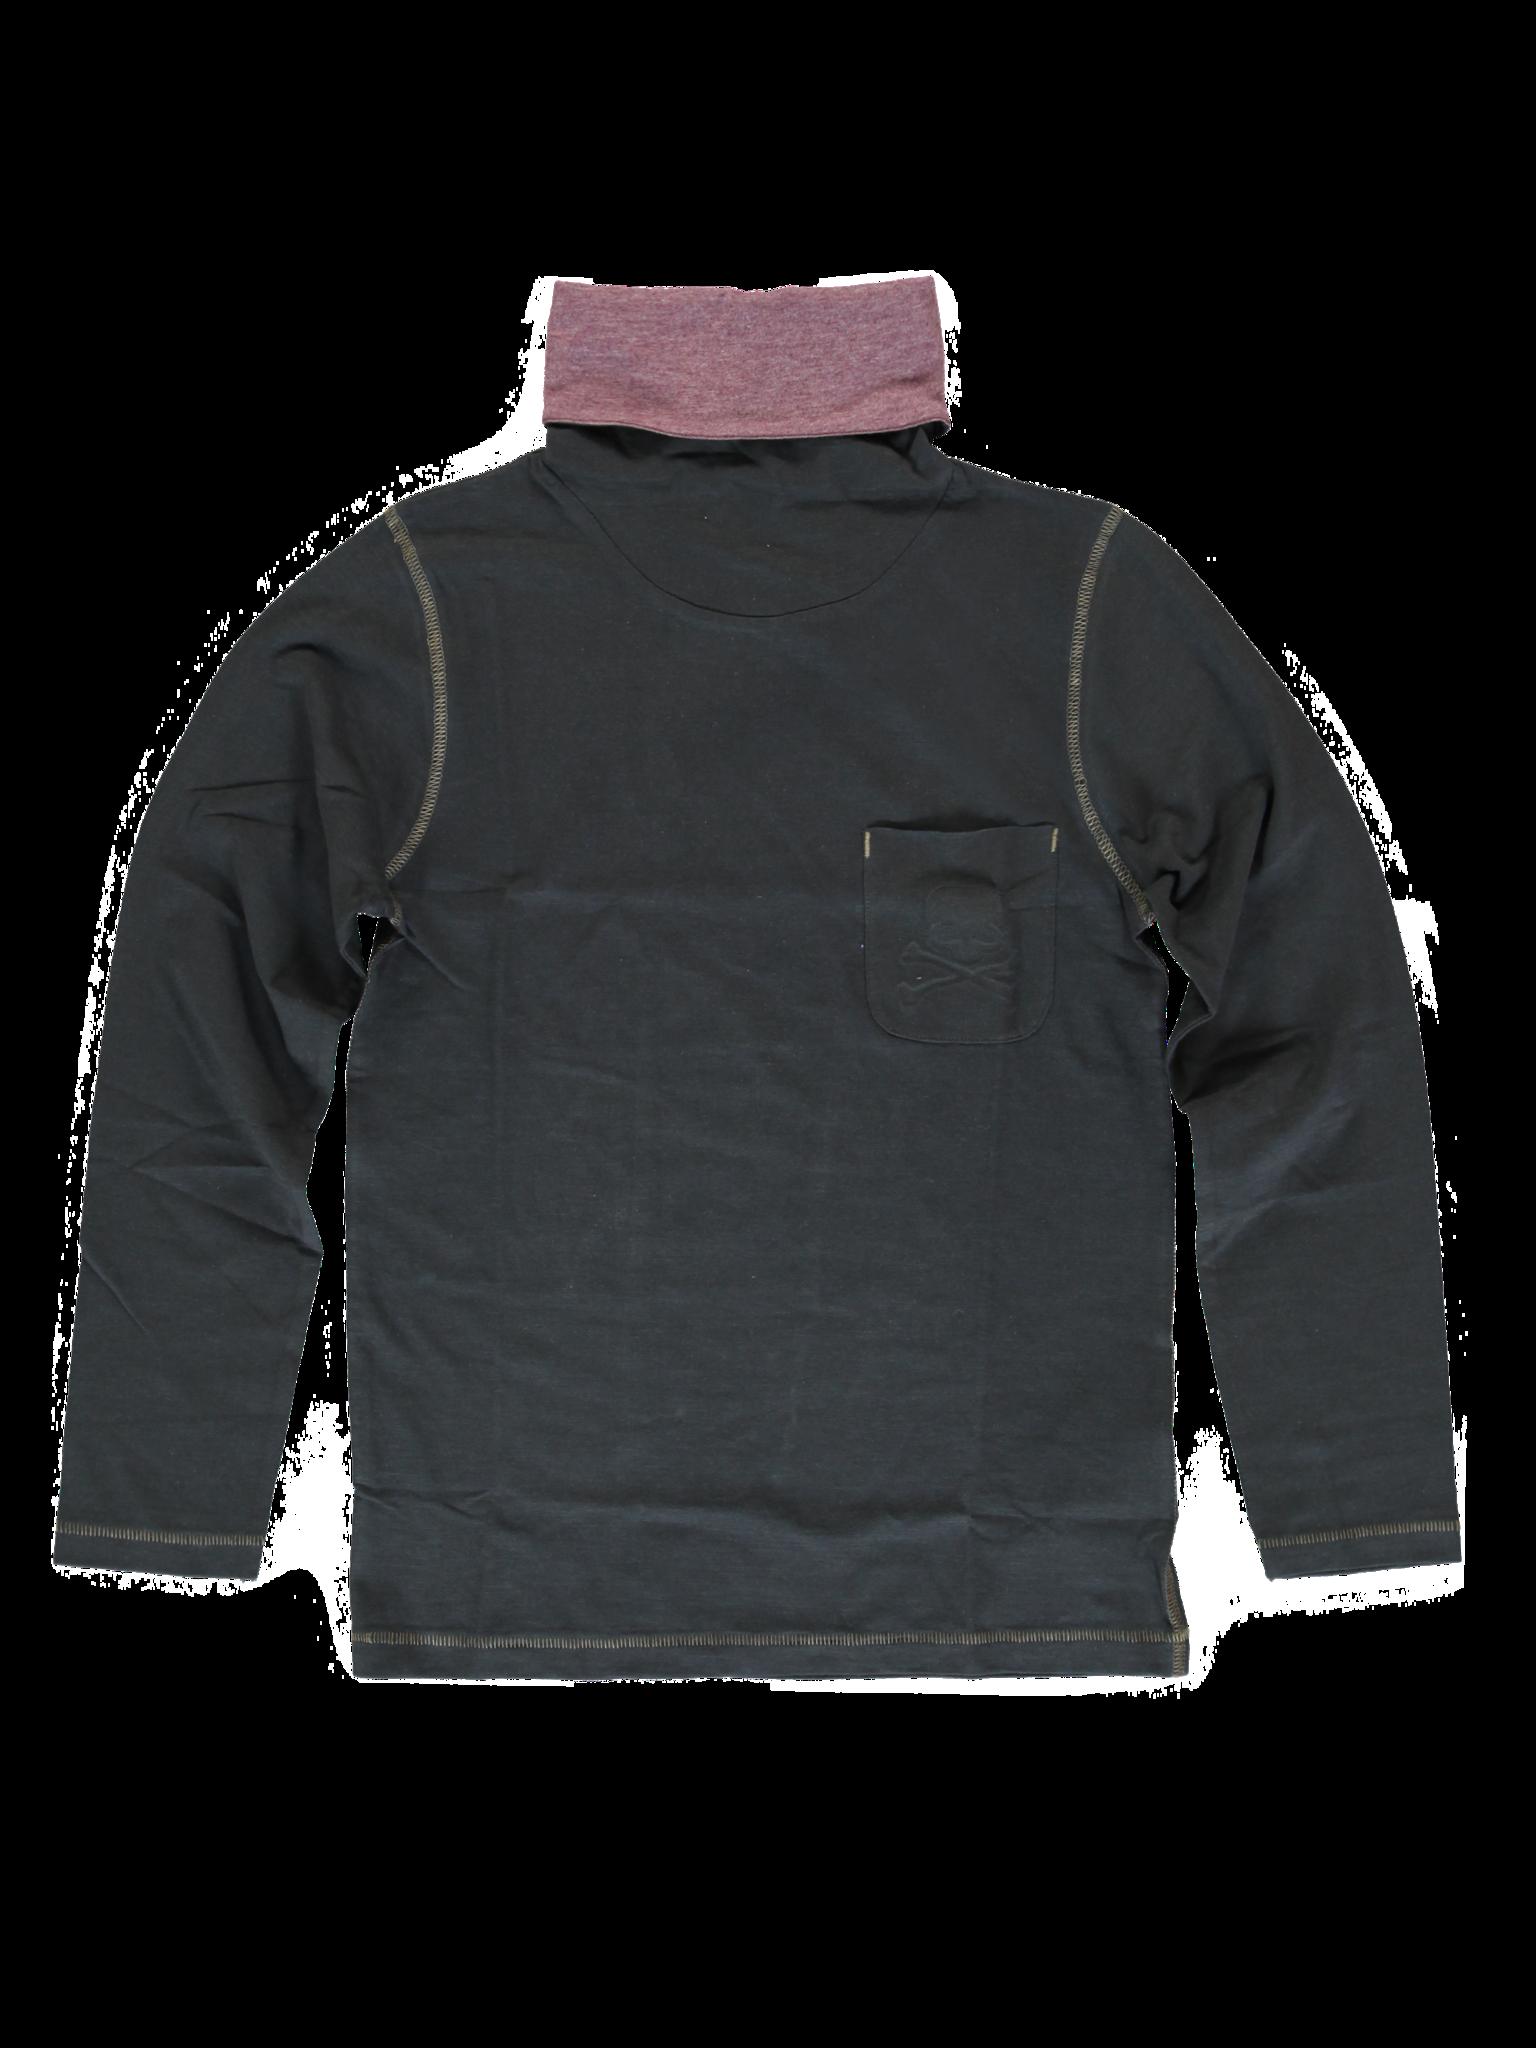 All Brands | Winterproducts Teen Boys | T-shirt | 24 pcs/box